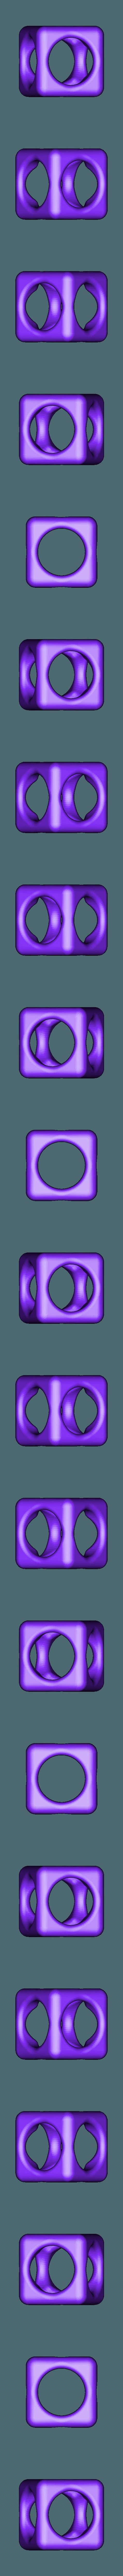 Cube SolidWorks (grand).STL Download free STL file Cubic Fidget • 3D printable template, Jean-Donald